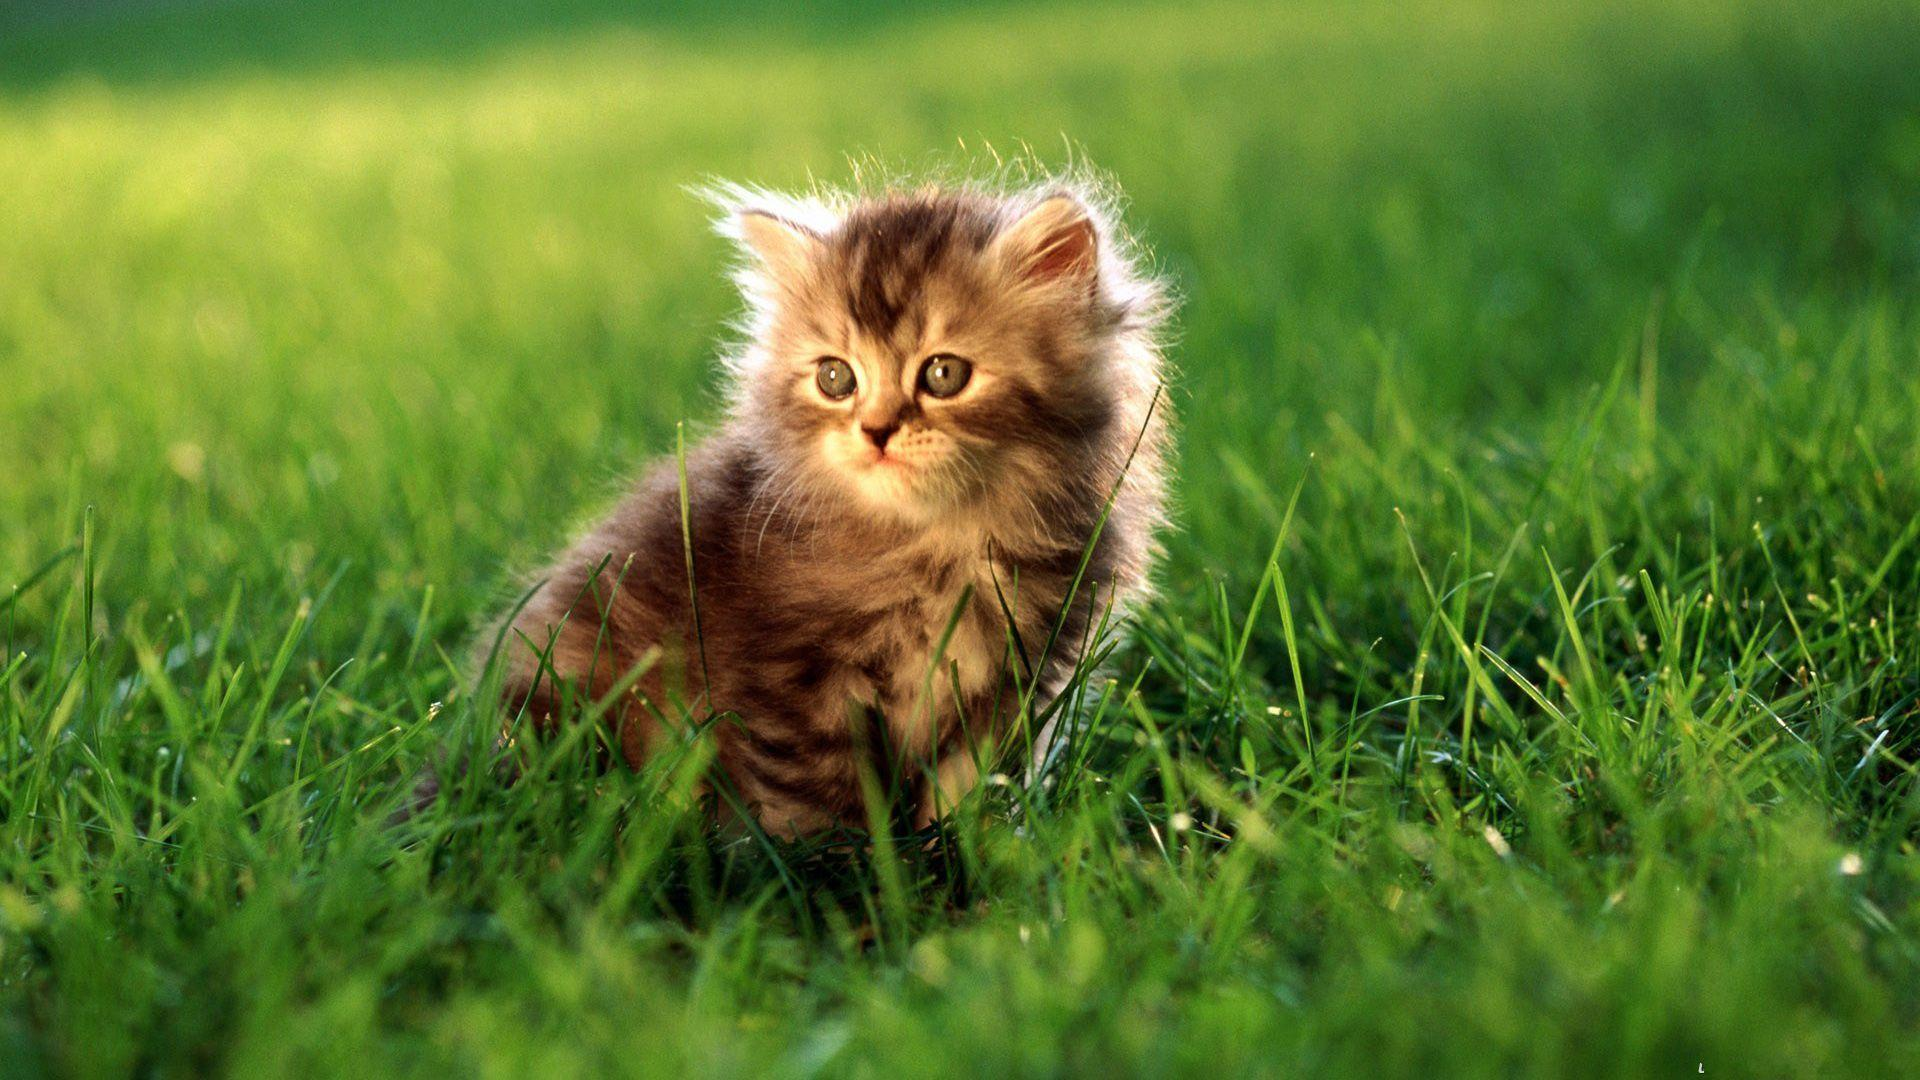 Cat Cute Animal HD Wallpaper of Animals   hdwallpaper2013com 1920x1080